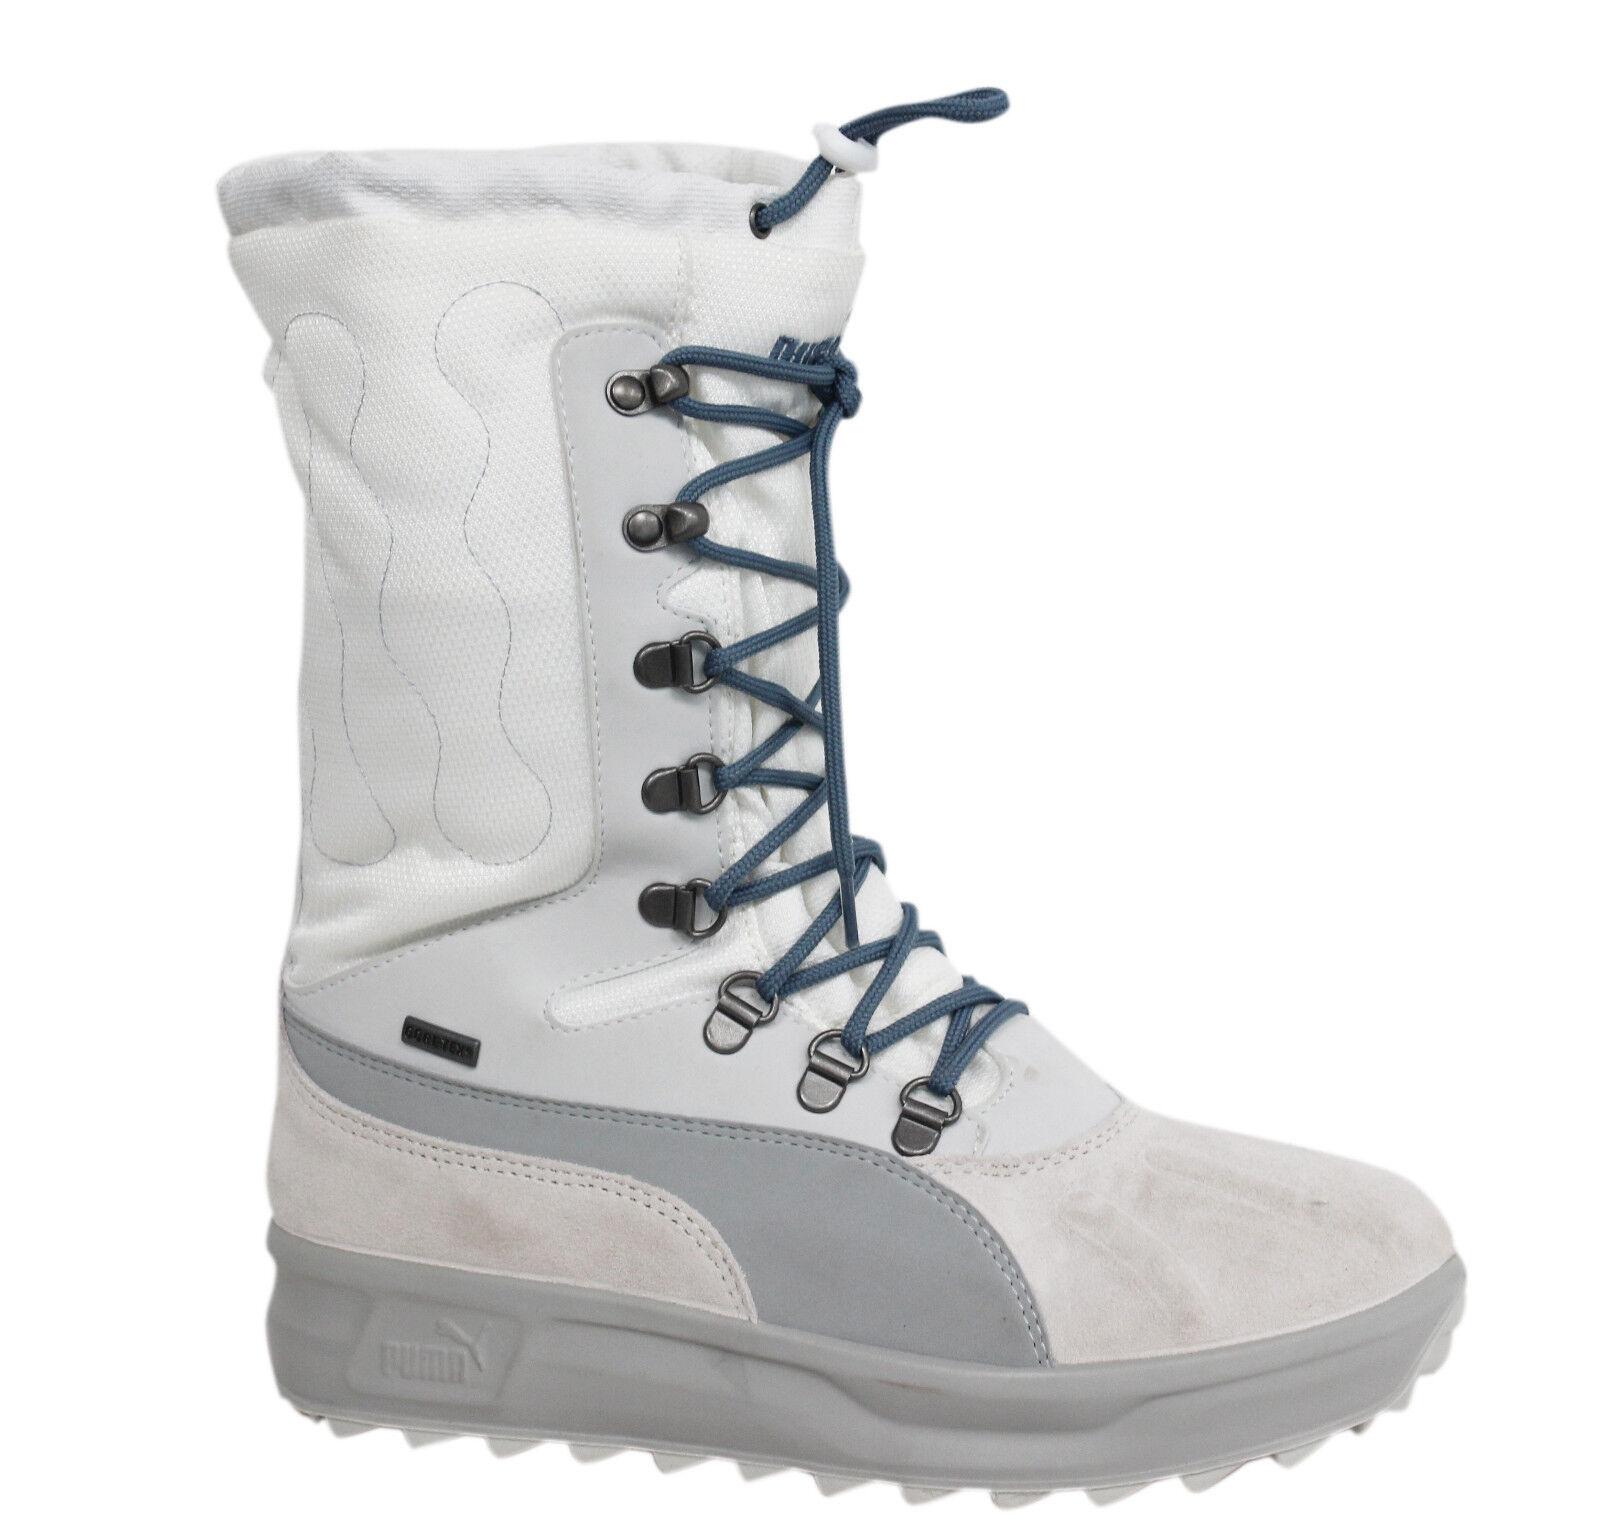 Puma Niveus GTX Gore-Tex blancooas con Cordones Mujer Stormcell botas 304271 08